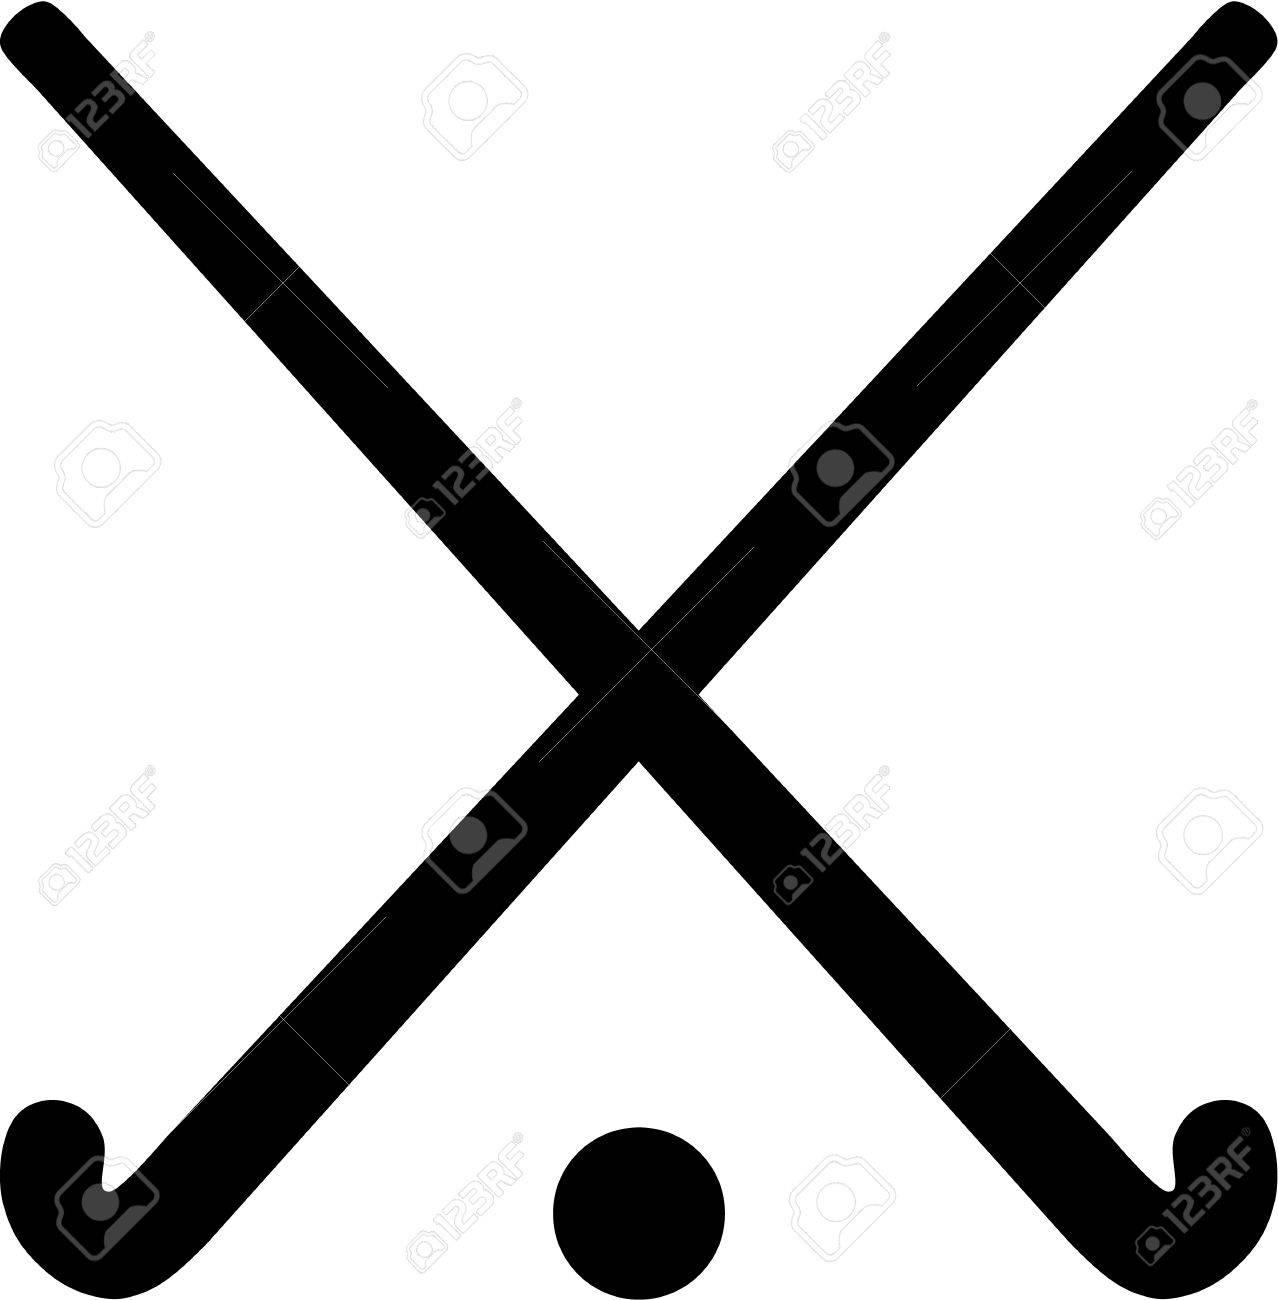 field hockey sticks with ball royalty free cliparts vectors and rh 123rf com field hockey stick vector free download hockey stick vector free download